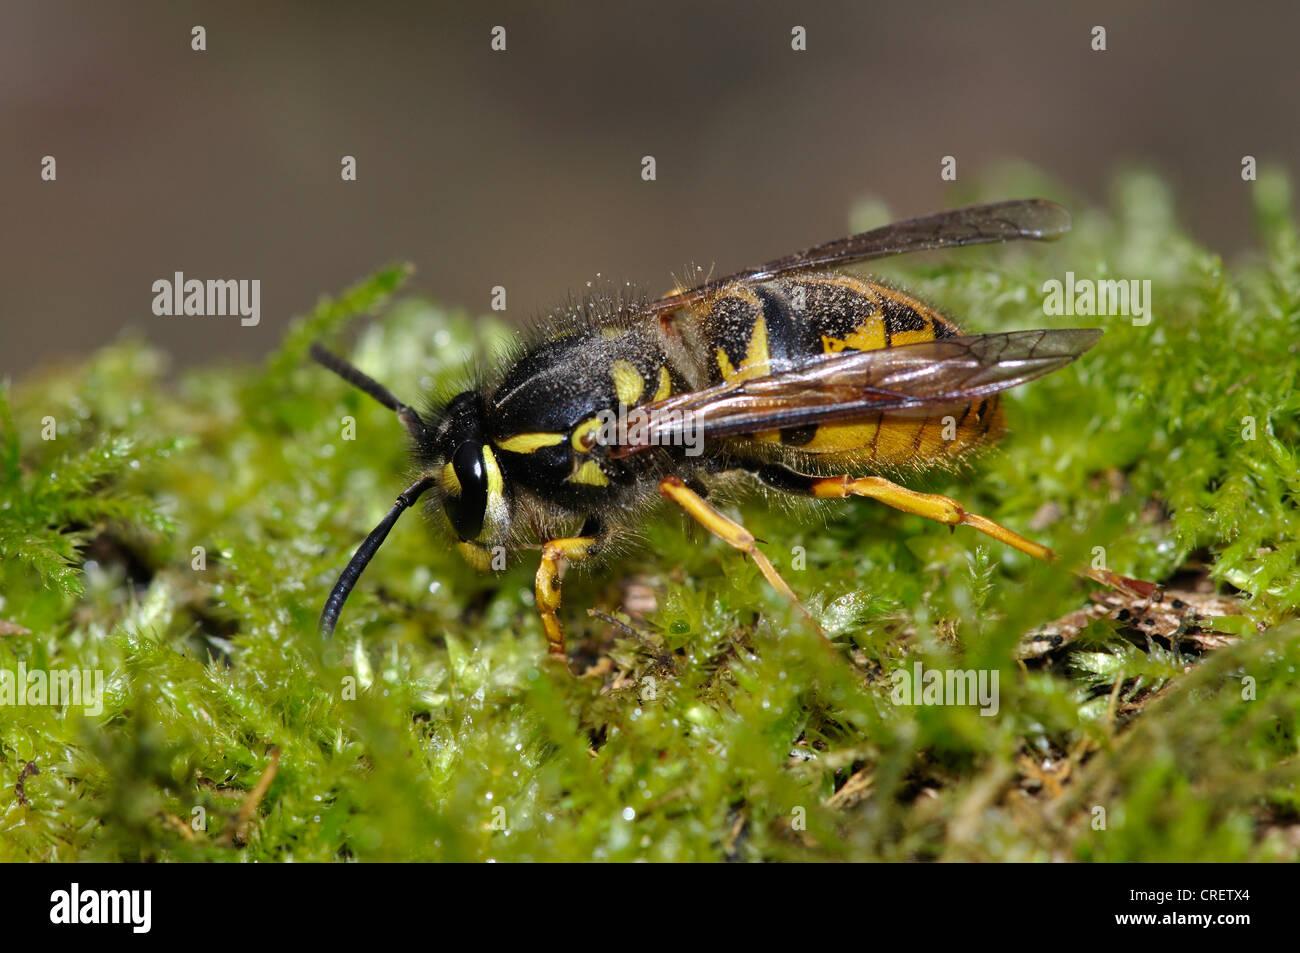 queen common wasp Vespidae vespula vulgaris social insect invertebrate - Stock Image